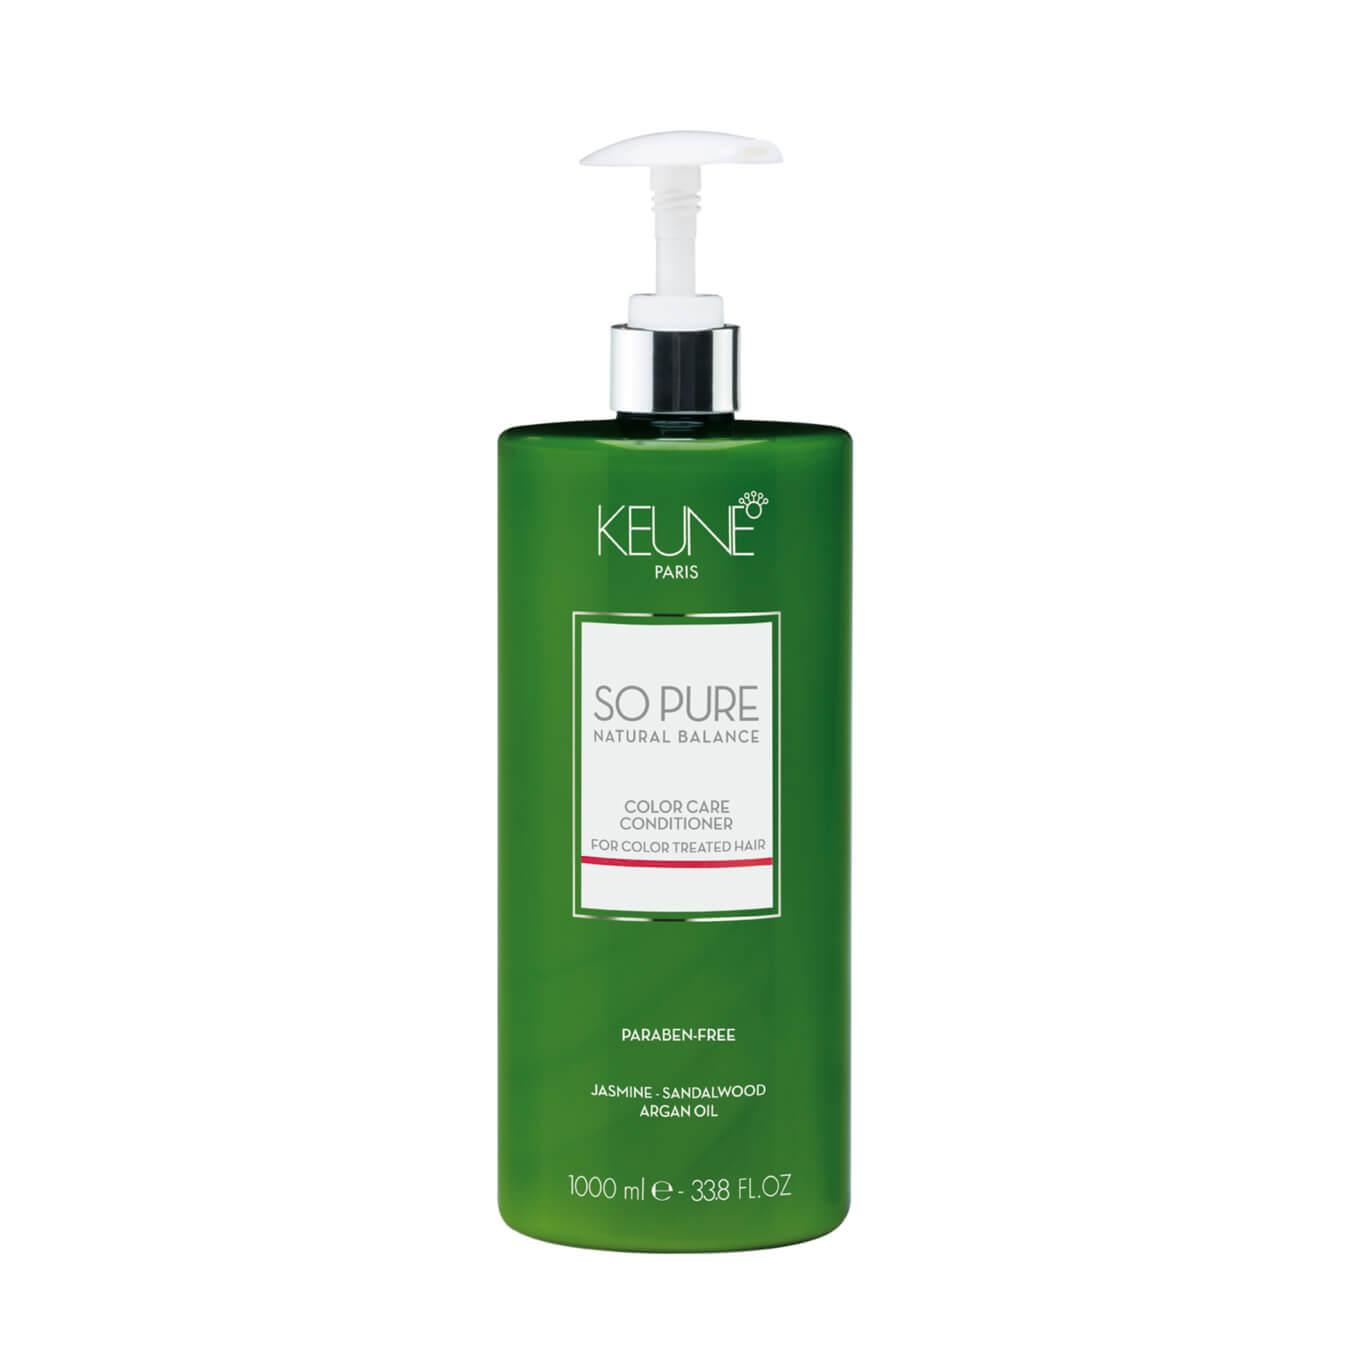 Kauf Keune So Pure Color Care Conditioner 1000ml